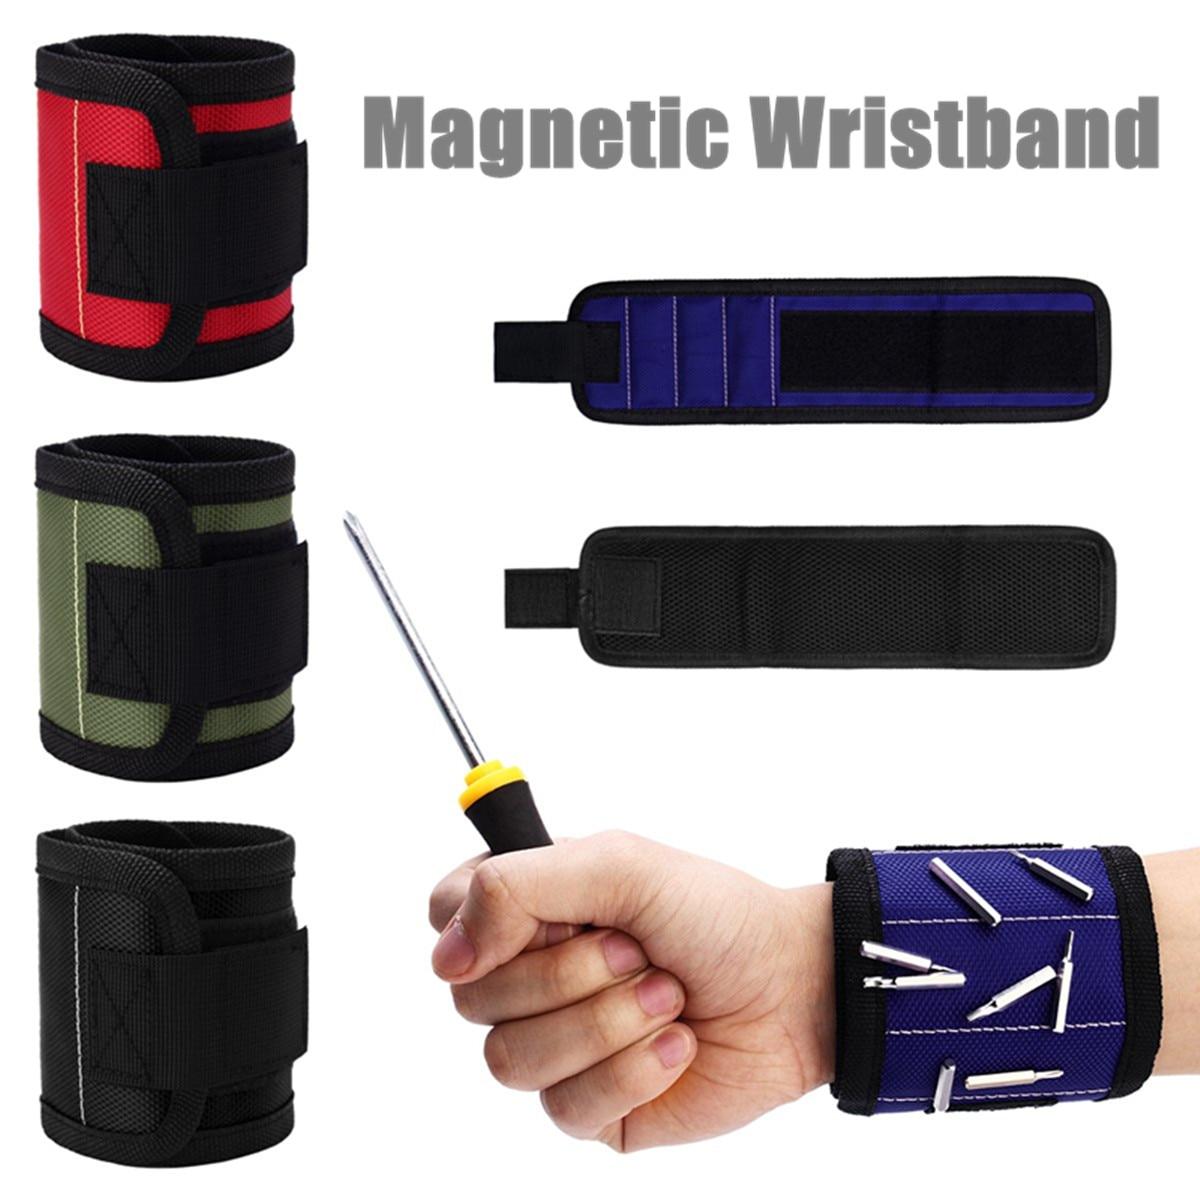 Magnetic Wristband Portable Tool Bag Electrician Wrist Tool Belt Screws Nails Drill Bits Bracelet Repair Tool Holder Organizers